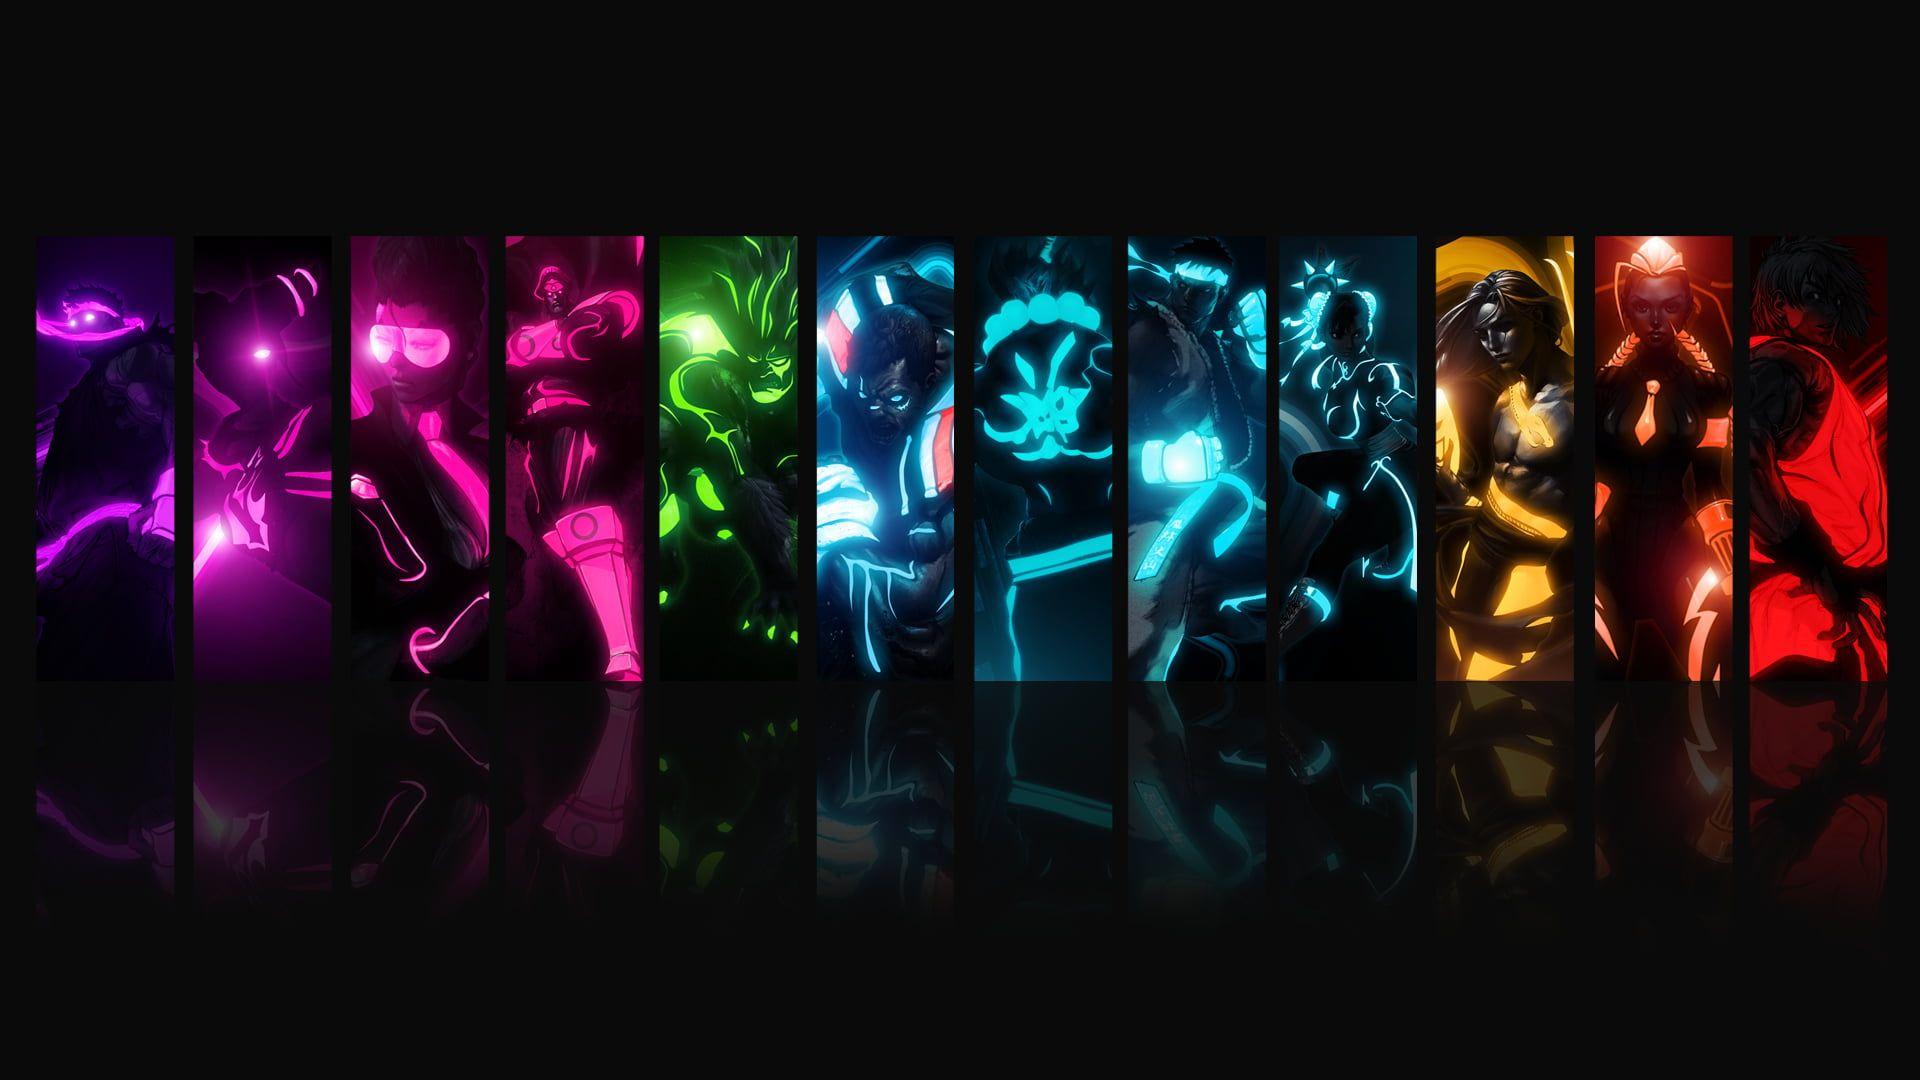 Street Fighter Video Games Collage 1080p Wallpaper Hdwallpaper Desktop In 2020 Backgrounds Desktop Cool Anime Wallpapers Gaming Desktop Backgrounds